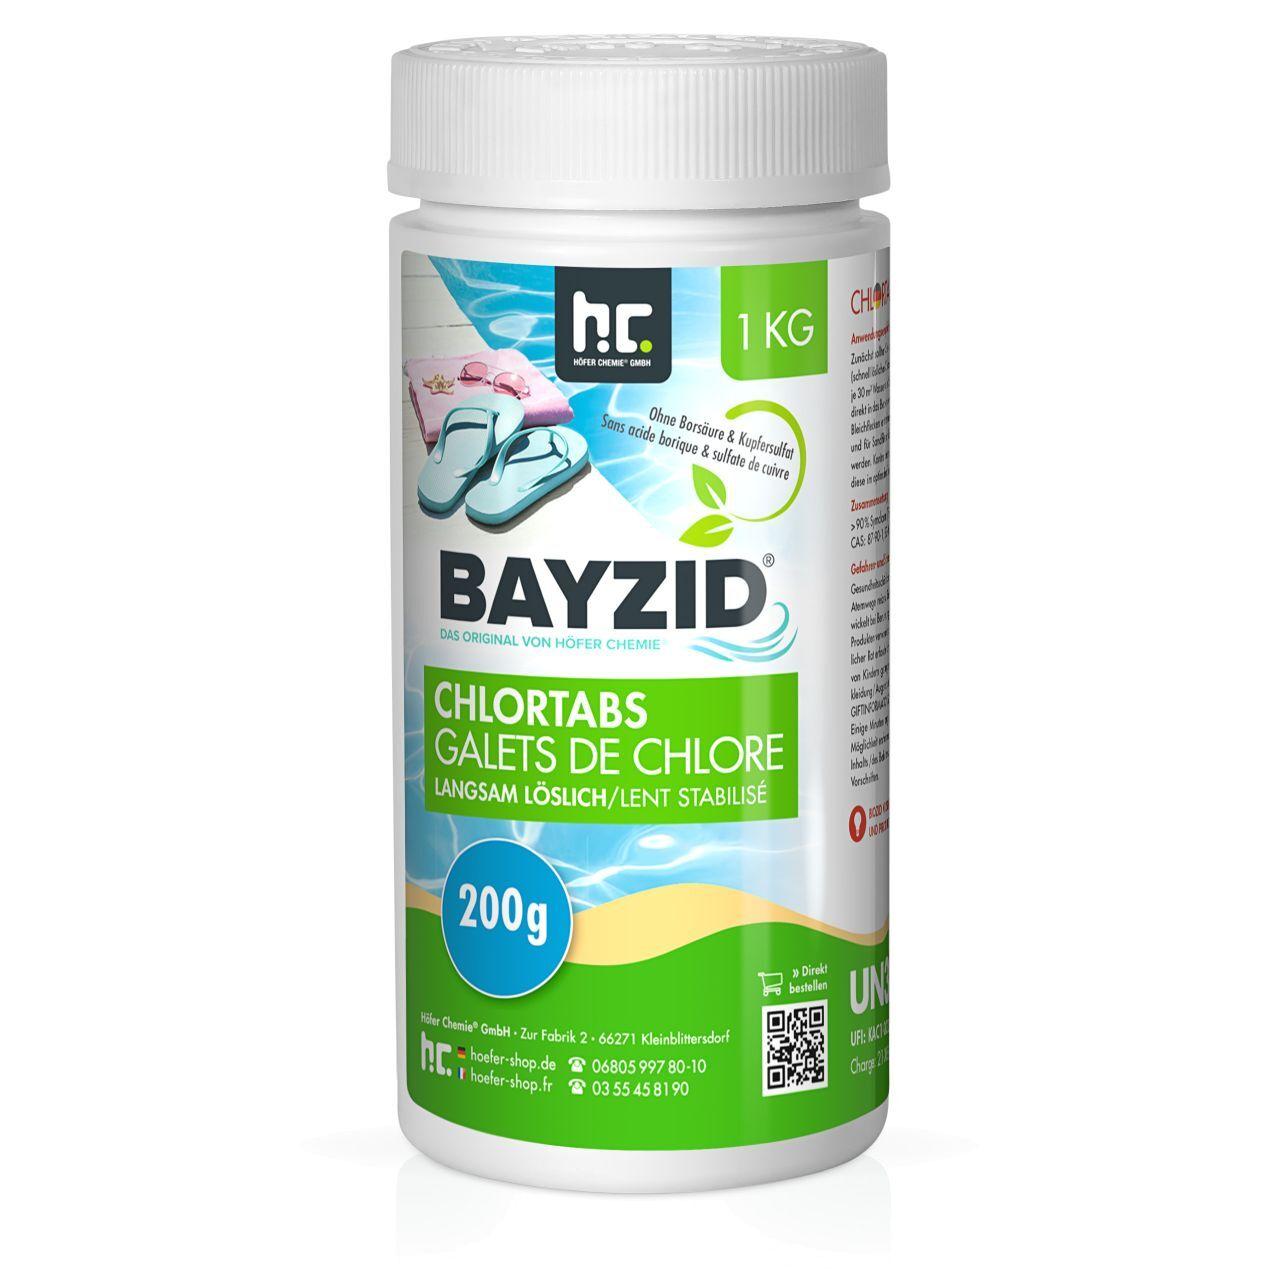 BAYZID 1 kg Bayzid® Galets de chlore lent (200g) (1 x 1 kg)